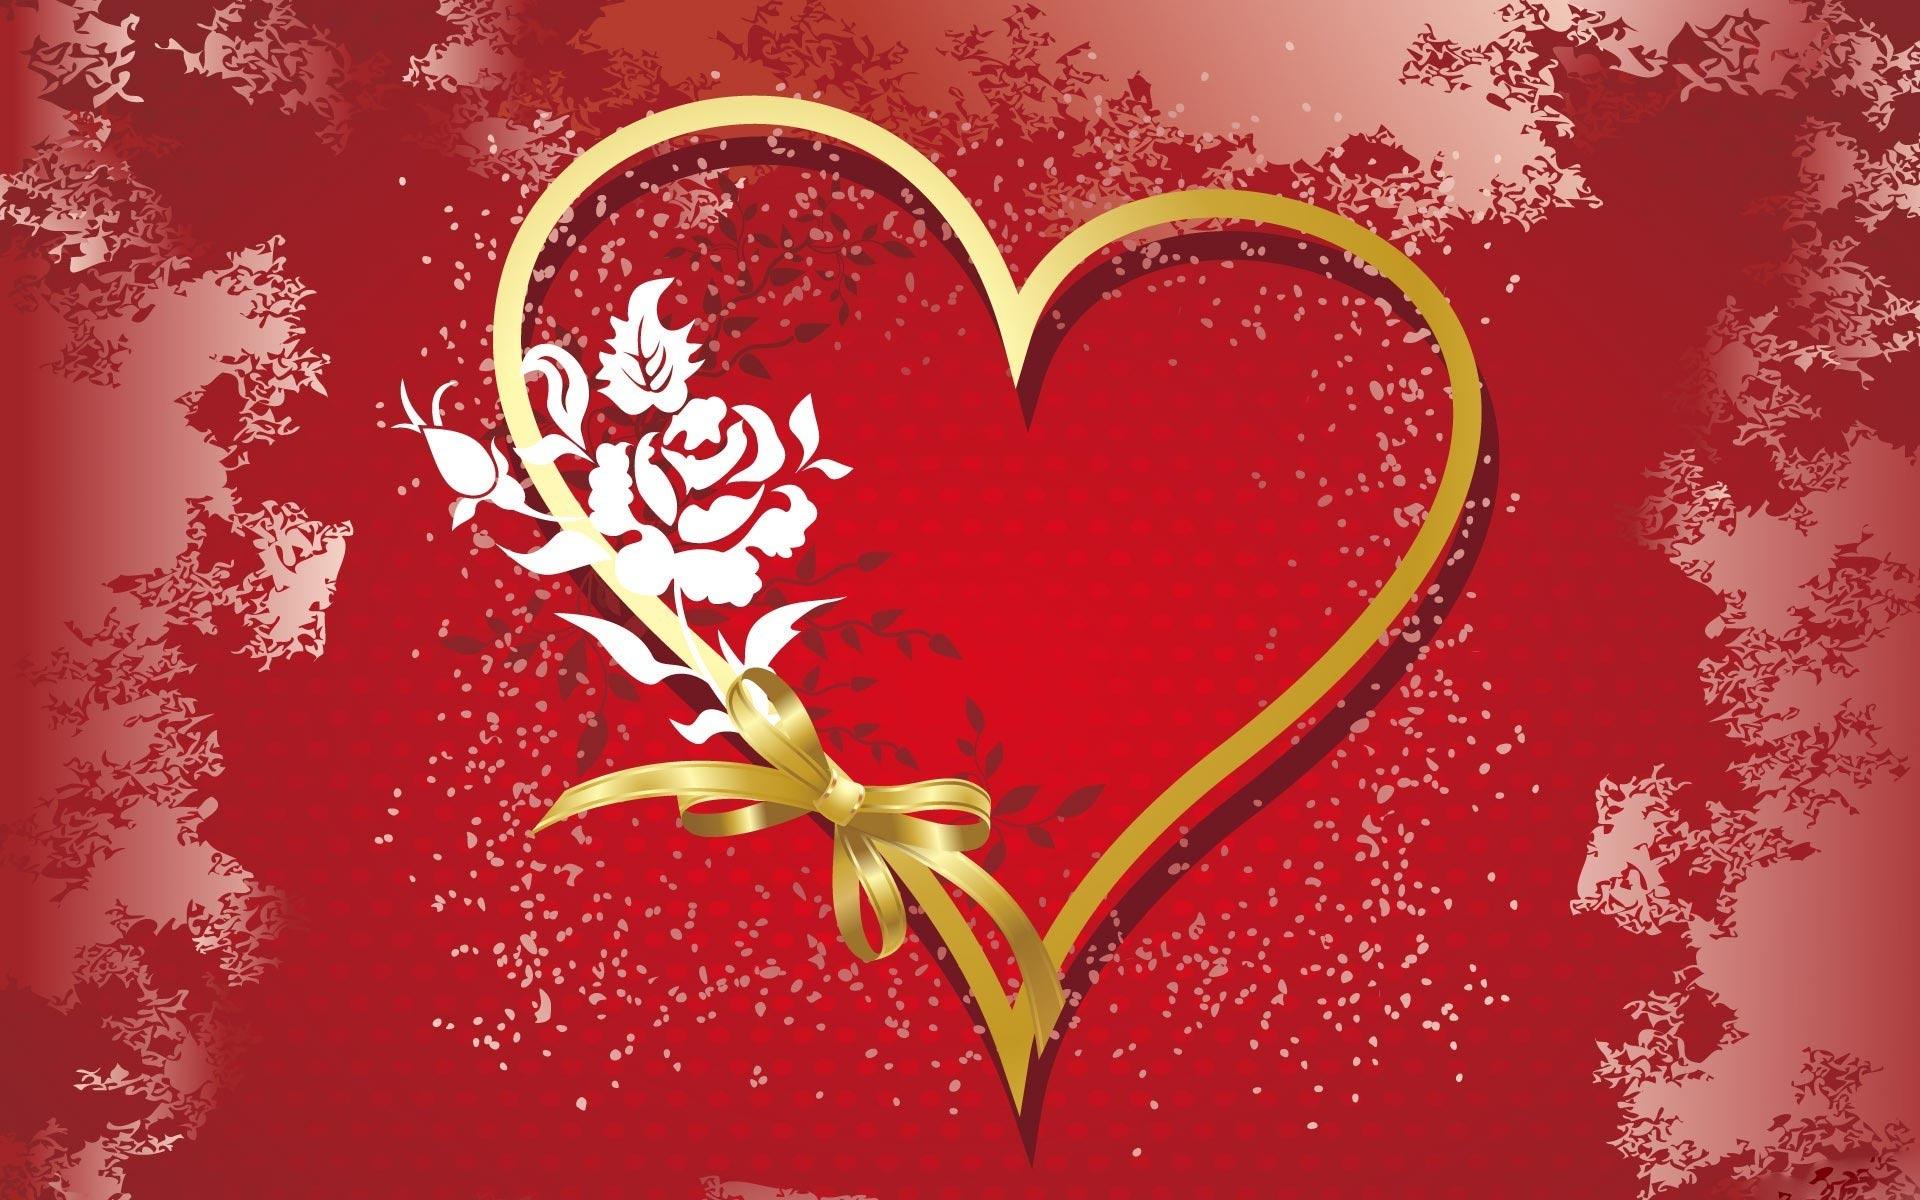 Love Hug Hd Wallpapers Romantic Hd Images Pixelstalk Net